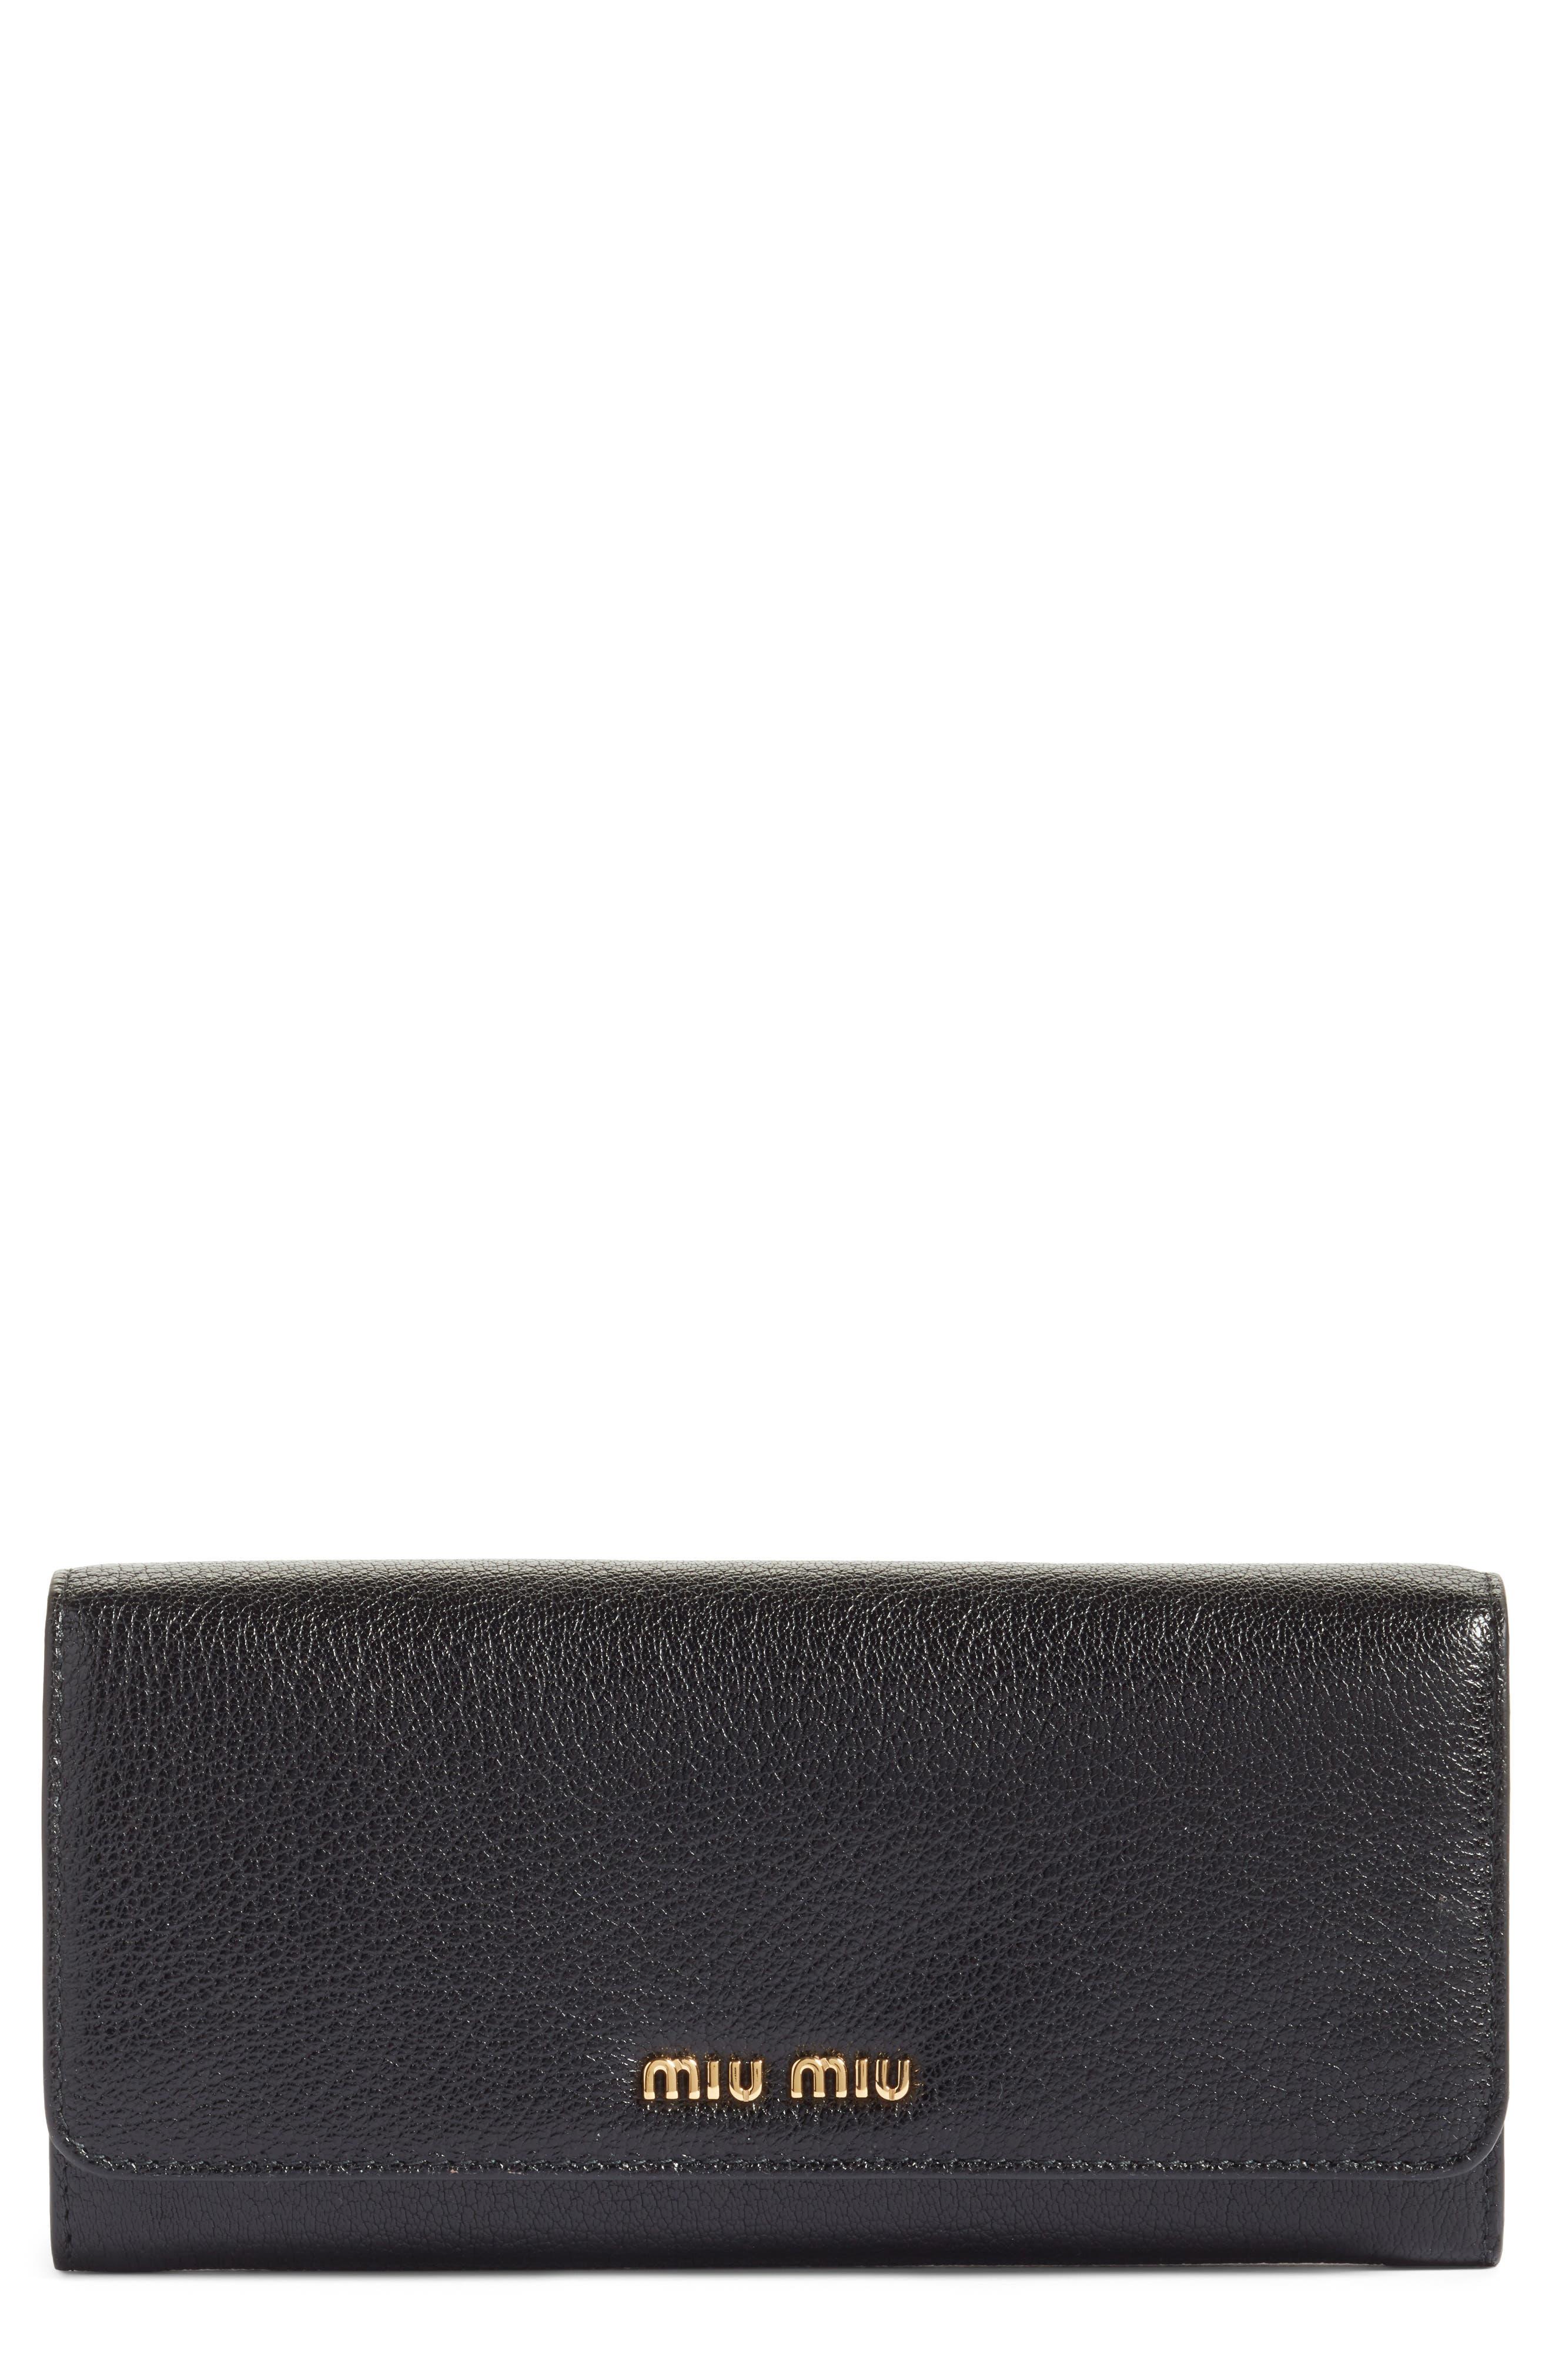 Miu Miu Madras Leather Continental Wallet